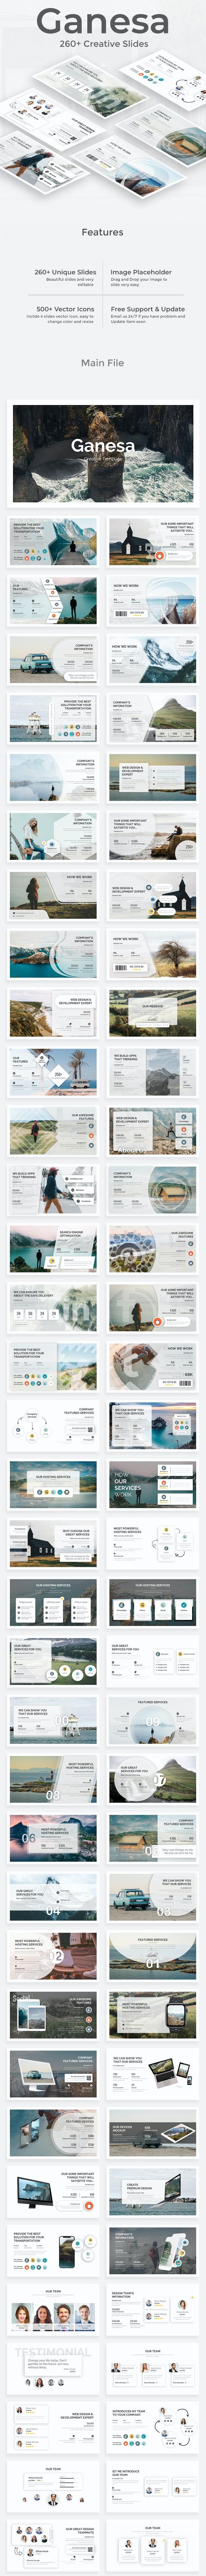 Ganesa Premium Powerpoint Template - Creative PowerPoint Templates